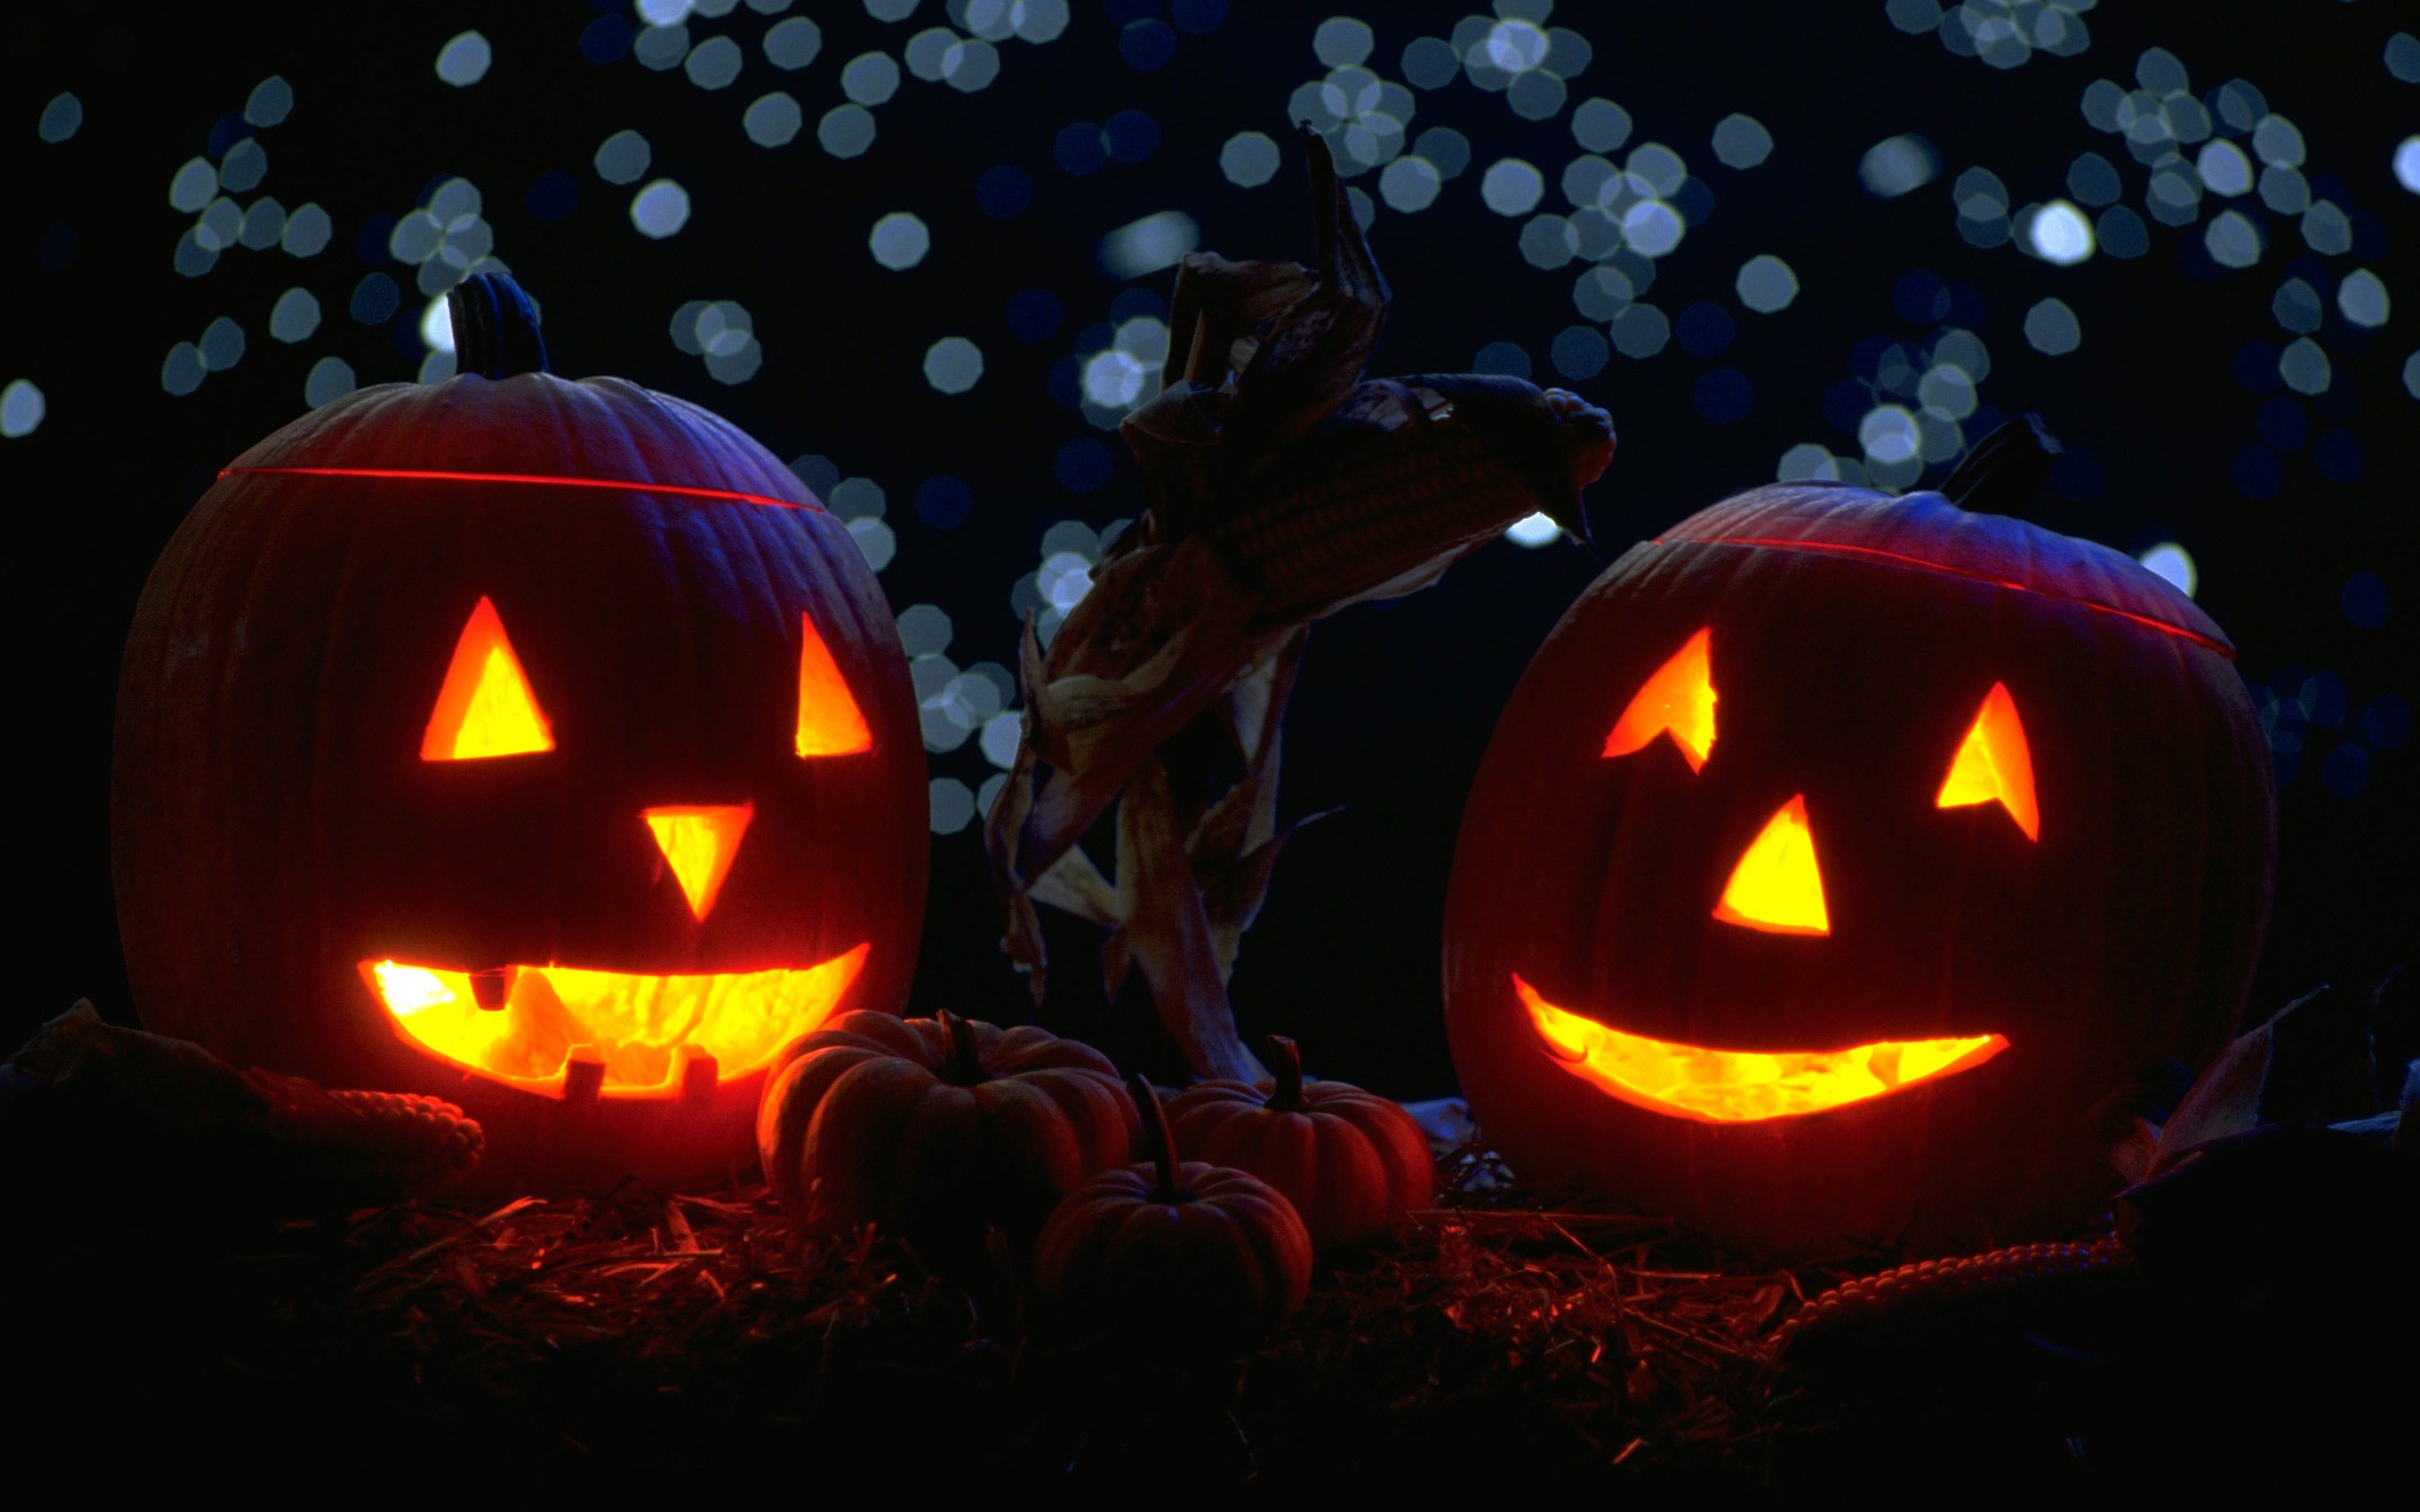 Pumpkins-mit-Kerzen-in-the-Nacht-Halloween-Widescreen-Wallpaper